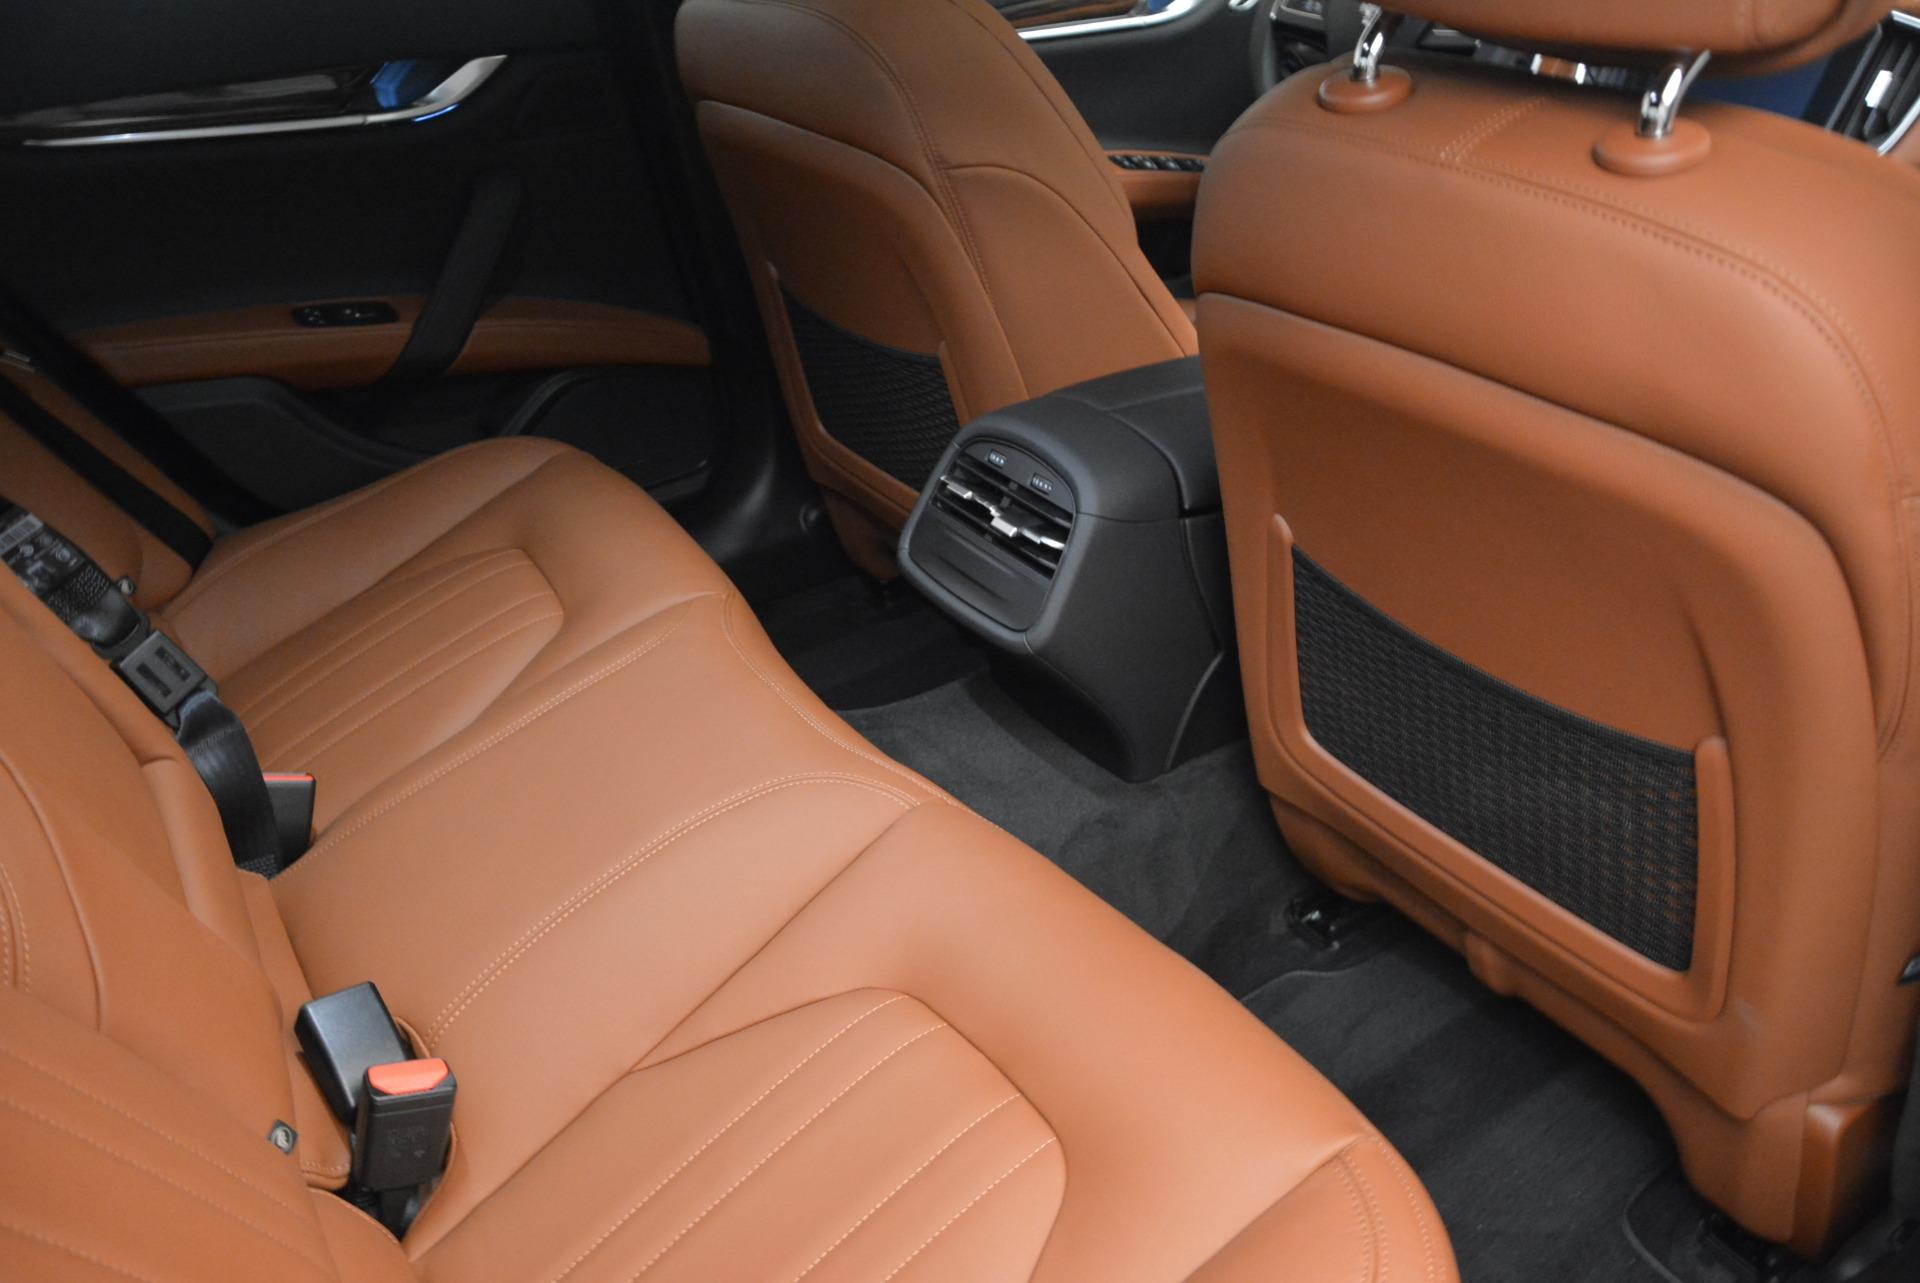 Used 2017 Maserati Ghibli S Q4 EX-LOANER For Sale In Greenwich, CT 608_p23